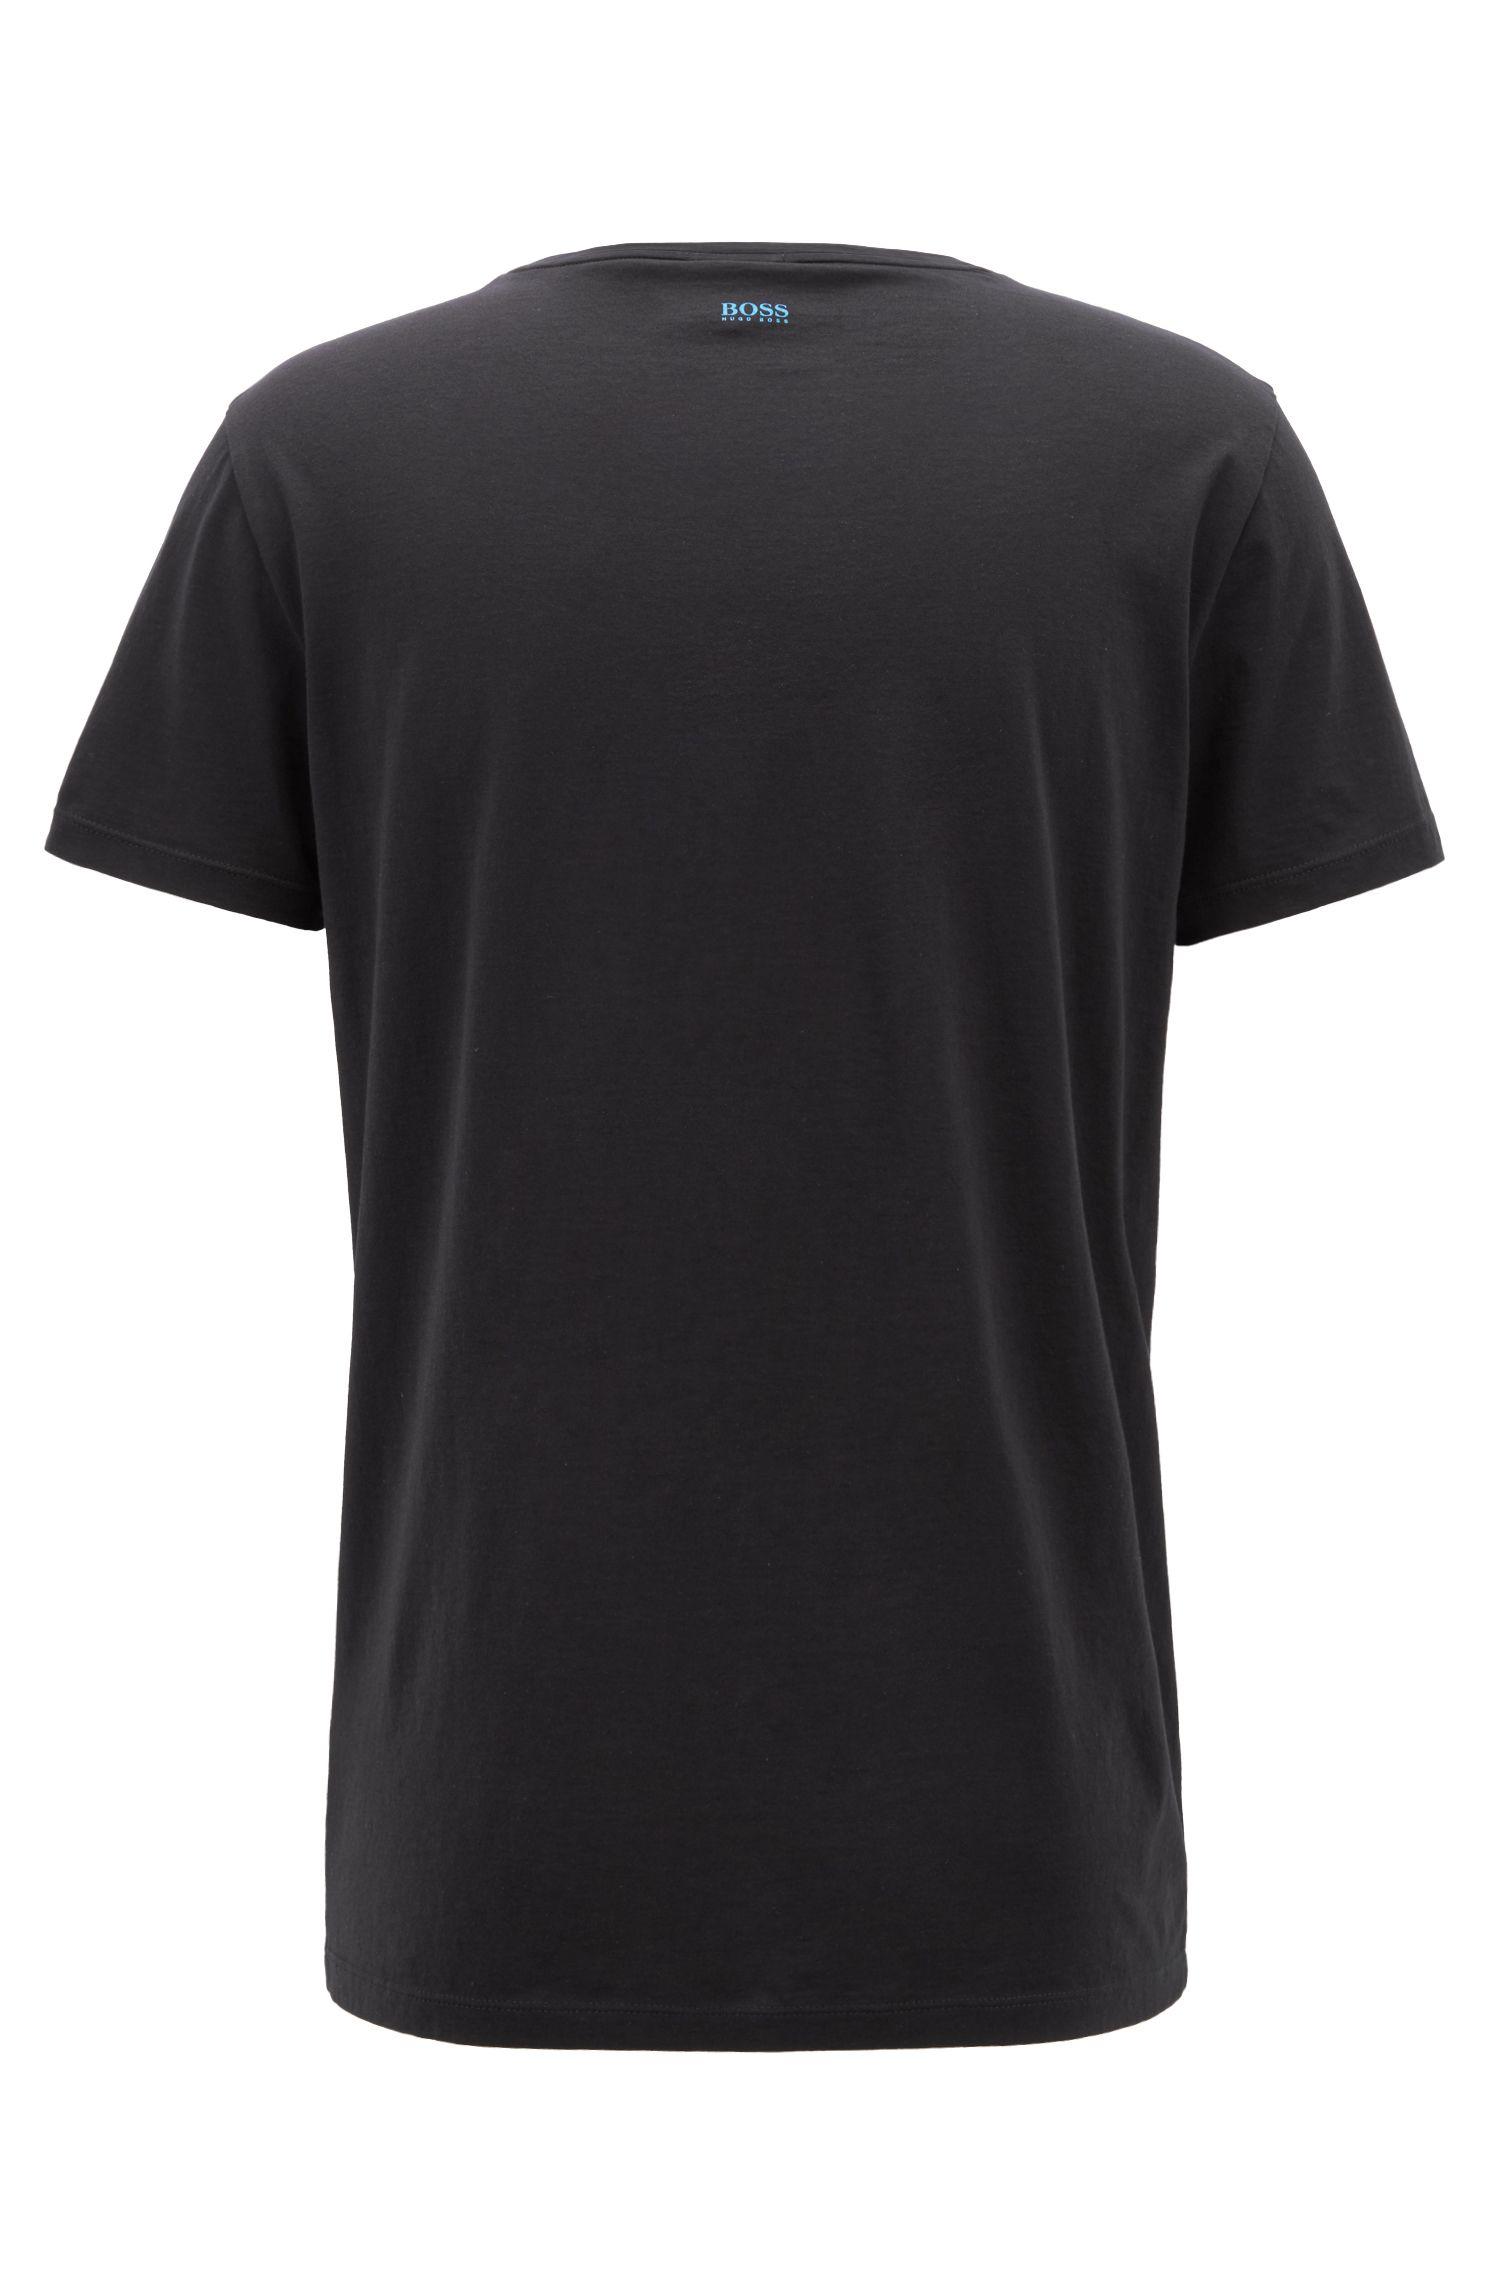 Crew-neck T-shirt in Pima cotton with photo print, Black